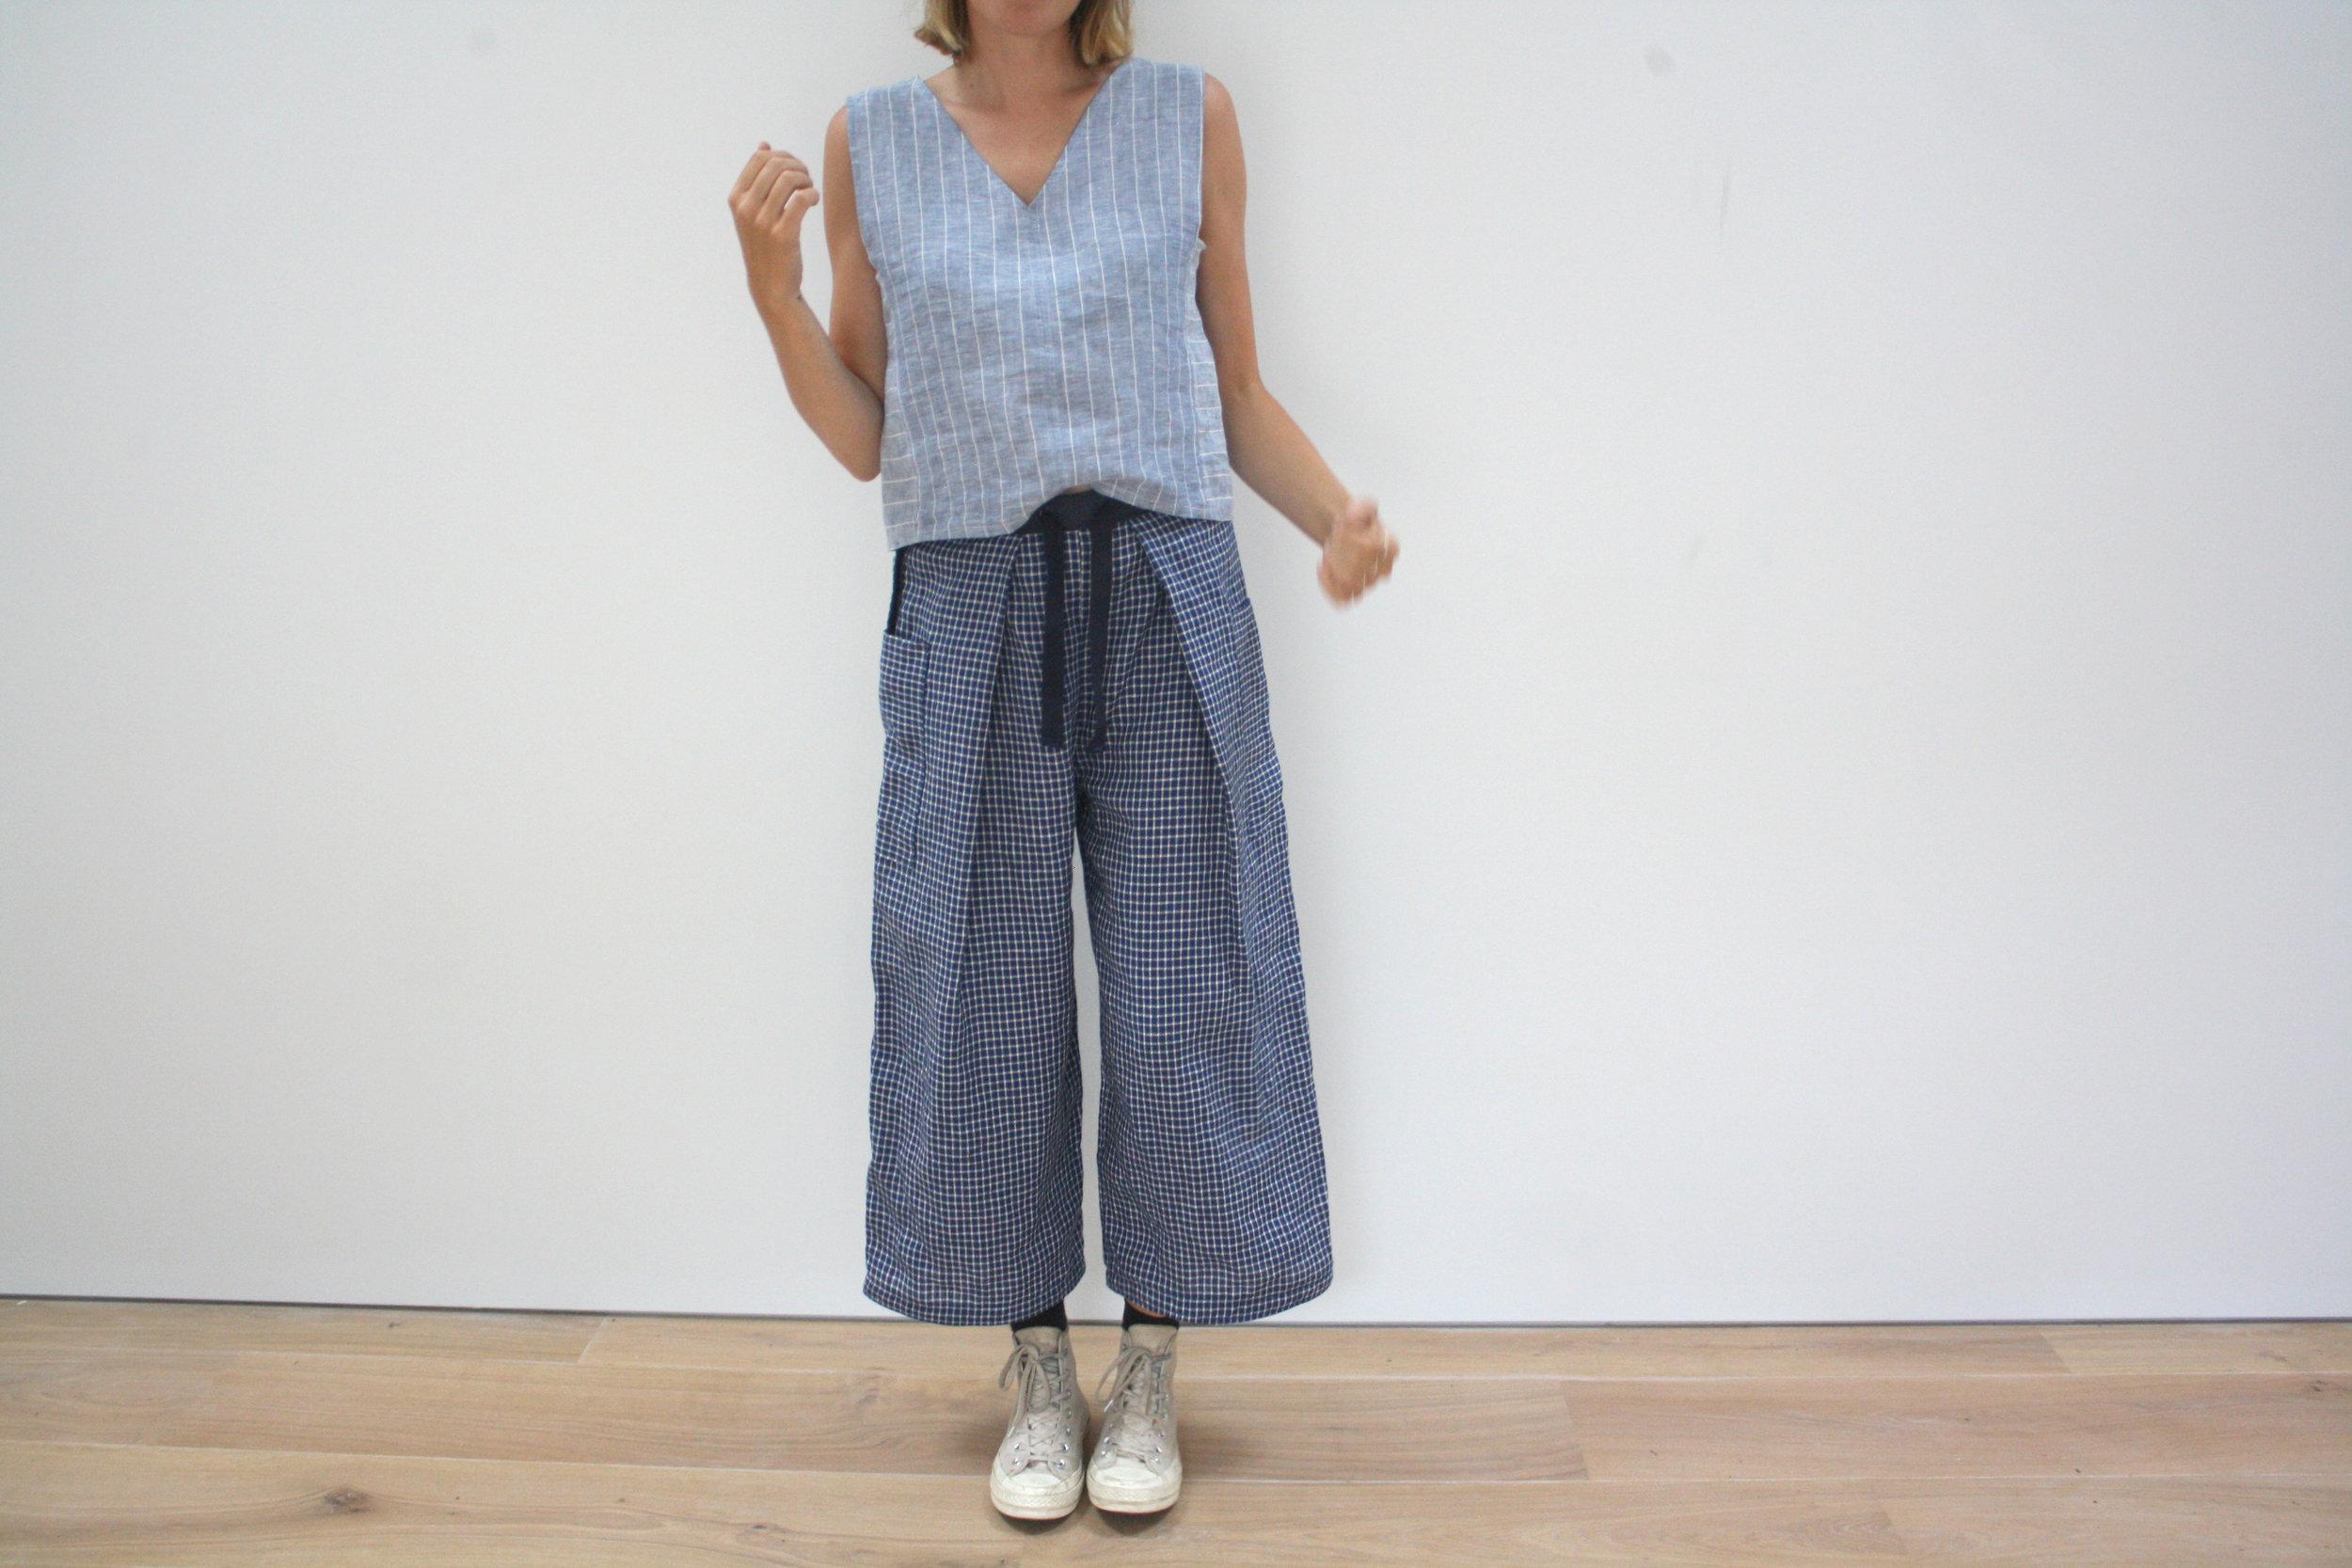 trousersvestworn.jpg